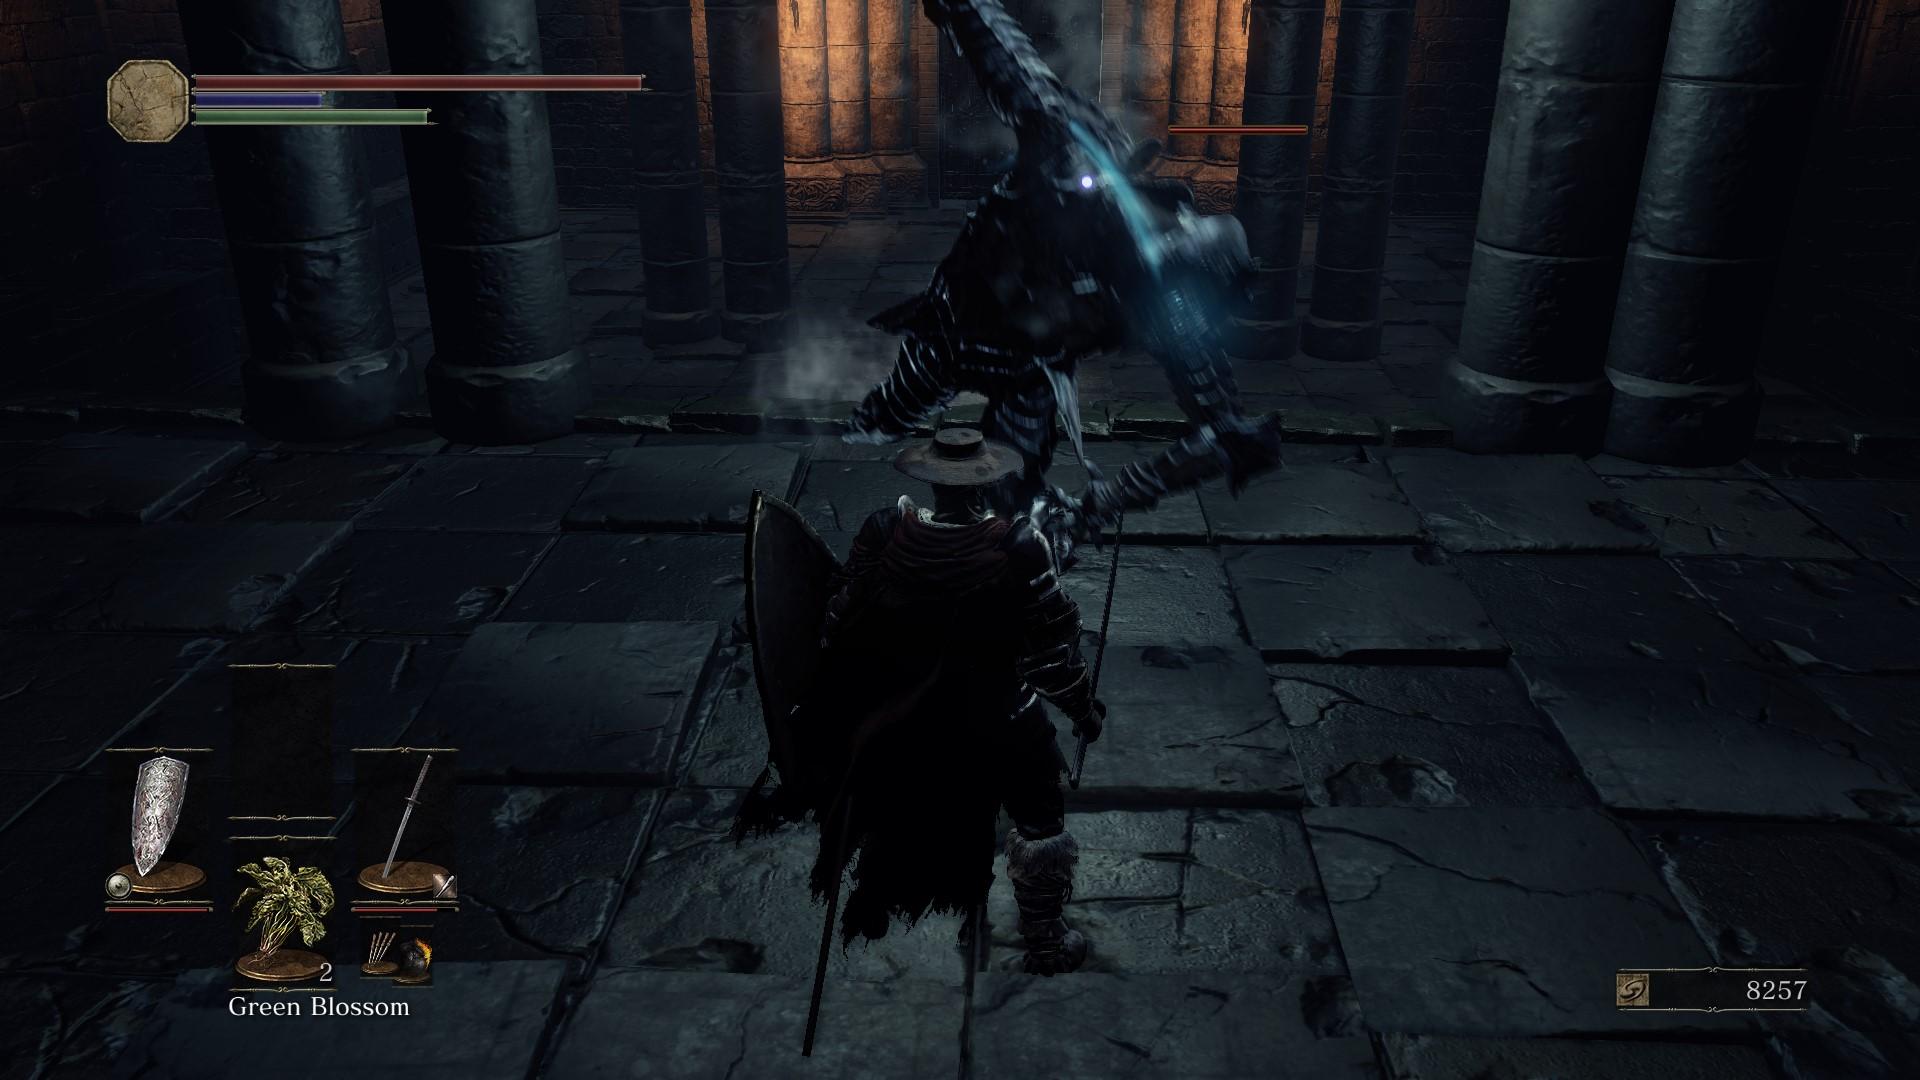 The 10 Things Every Dark Souls 3 Beginner Should Know | Shacknews